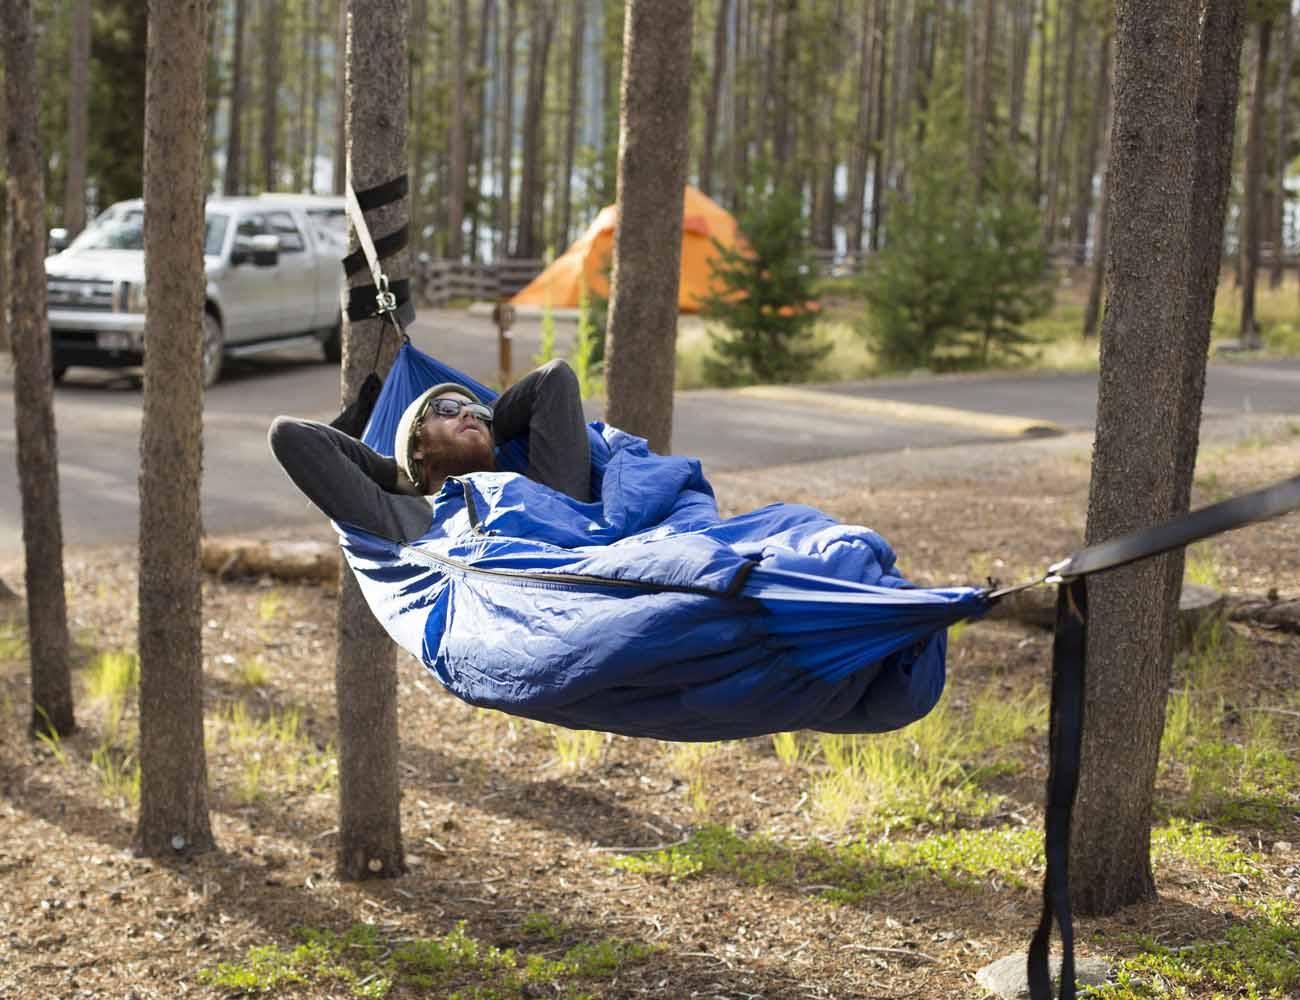 Bison Bag G1 – The World's First Sleeping Bag Hammock